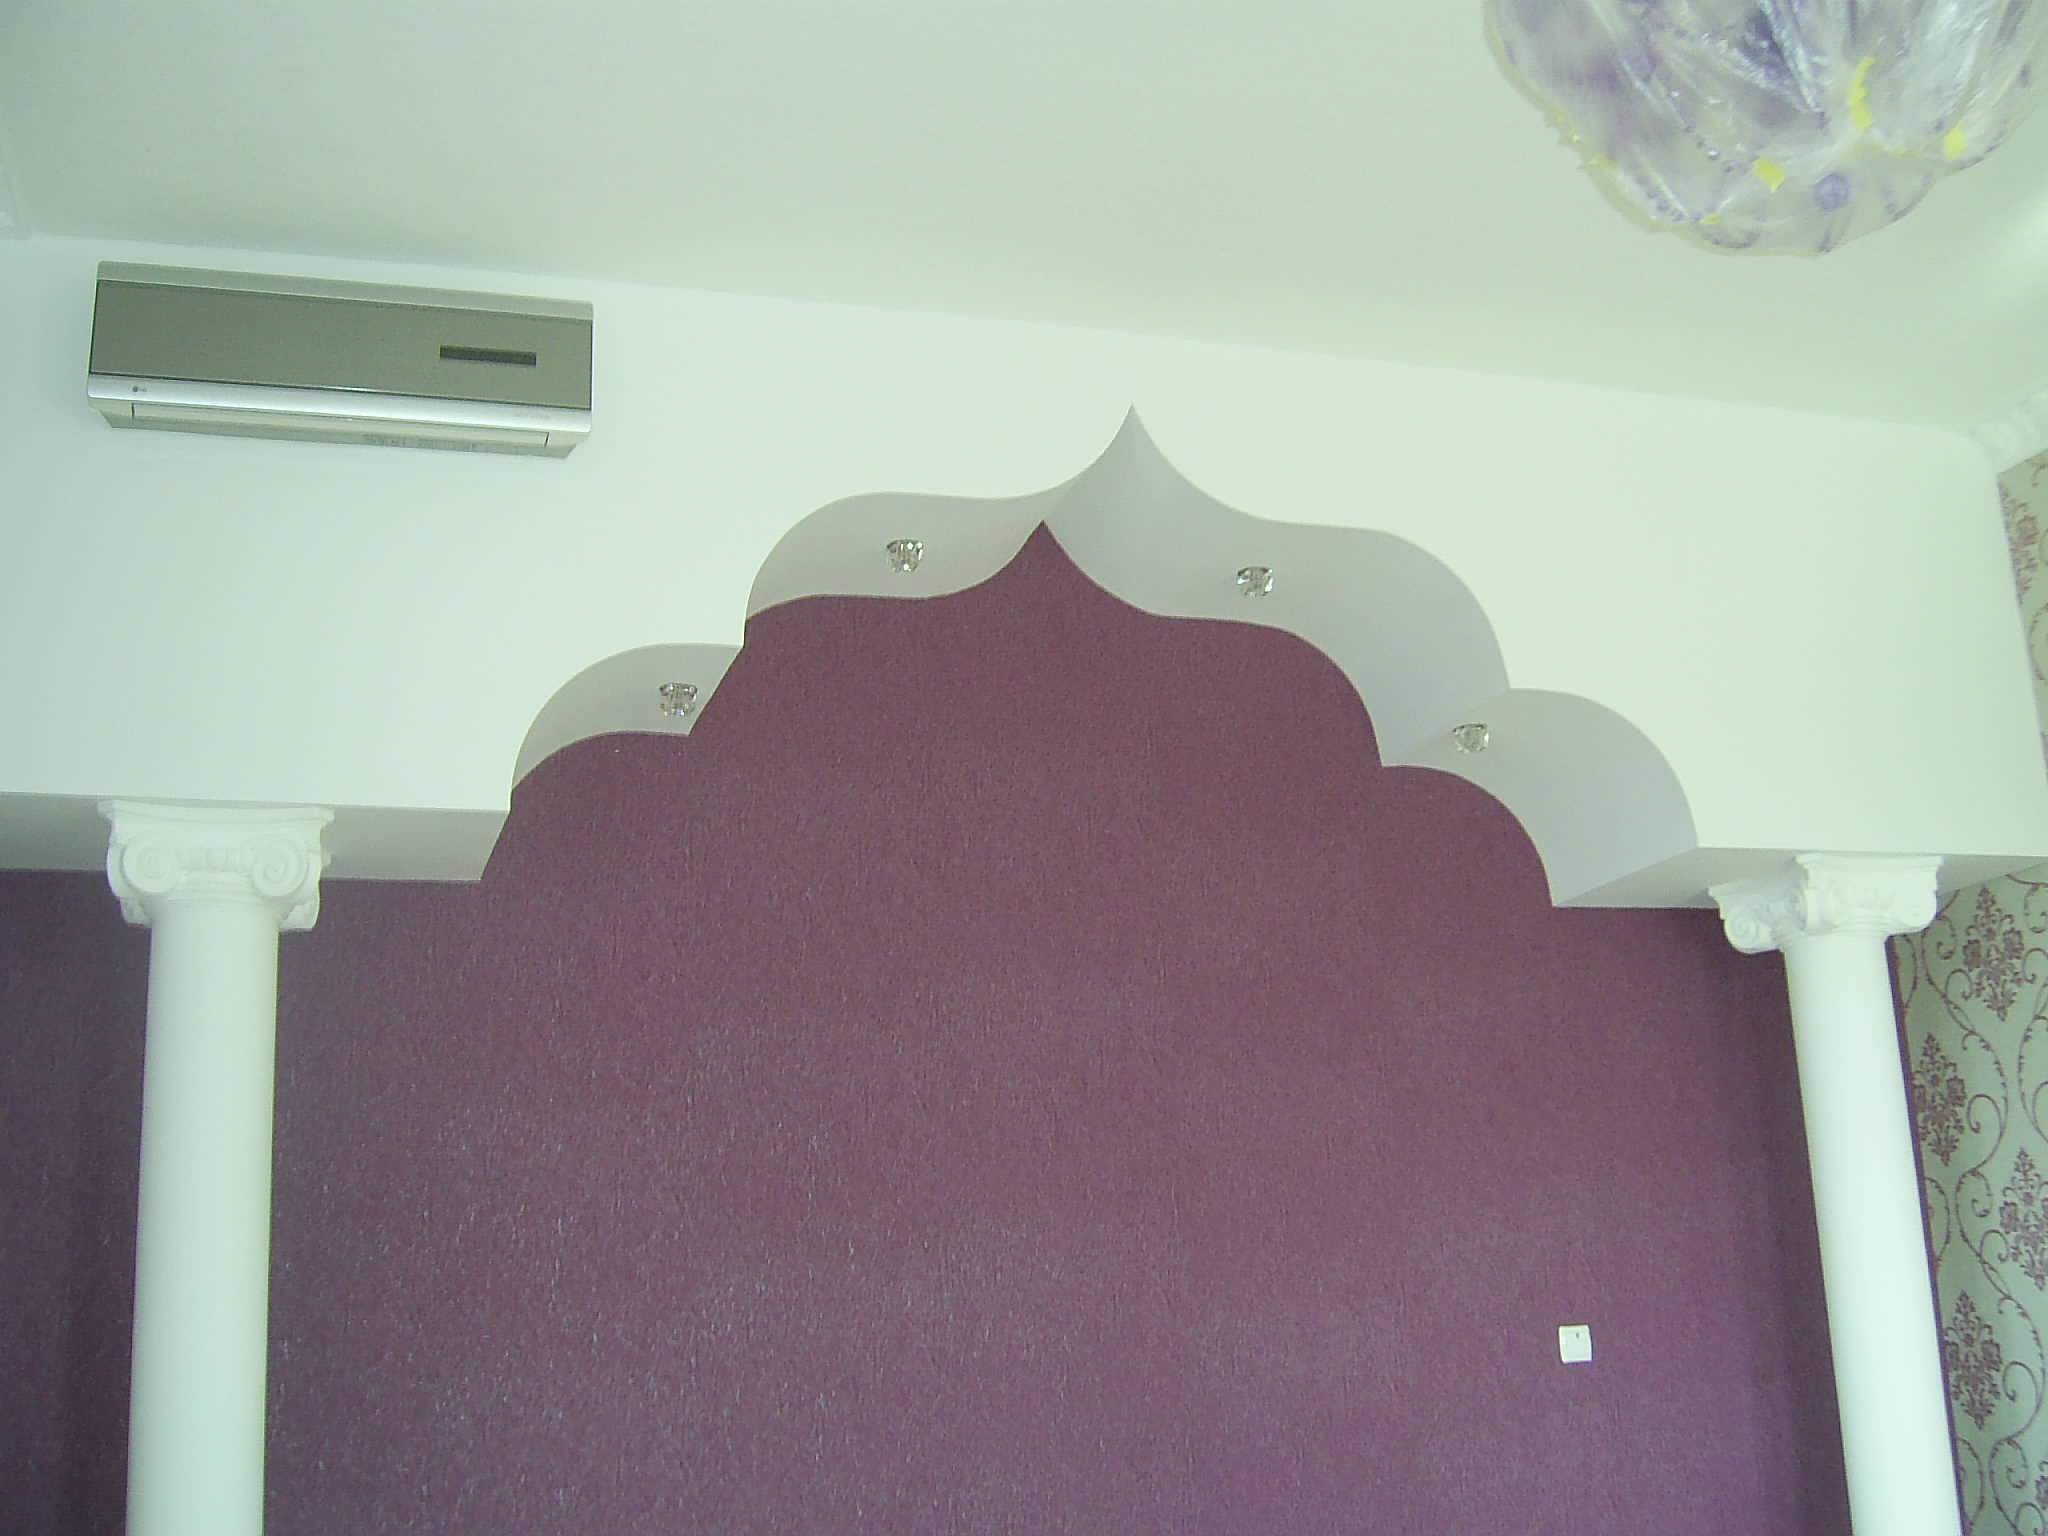 Дизайн арки из гипсокартона своими руками фото